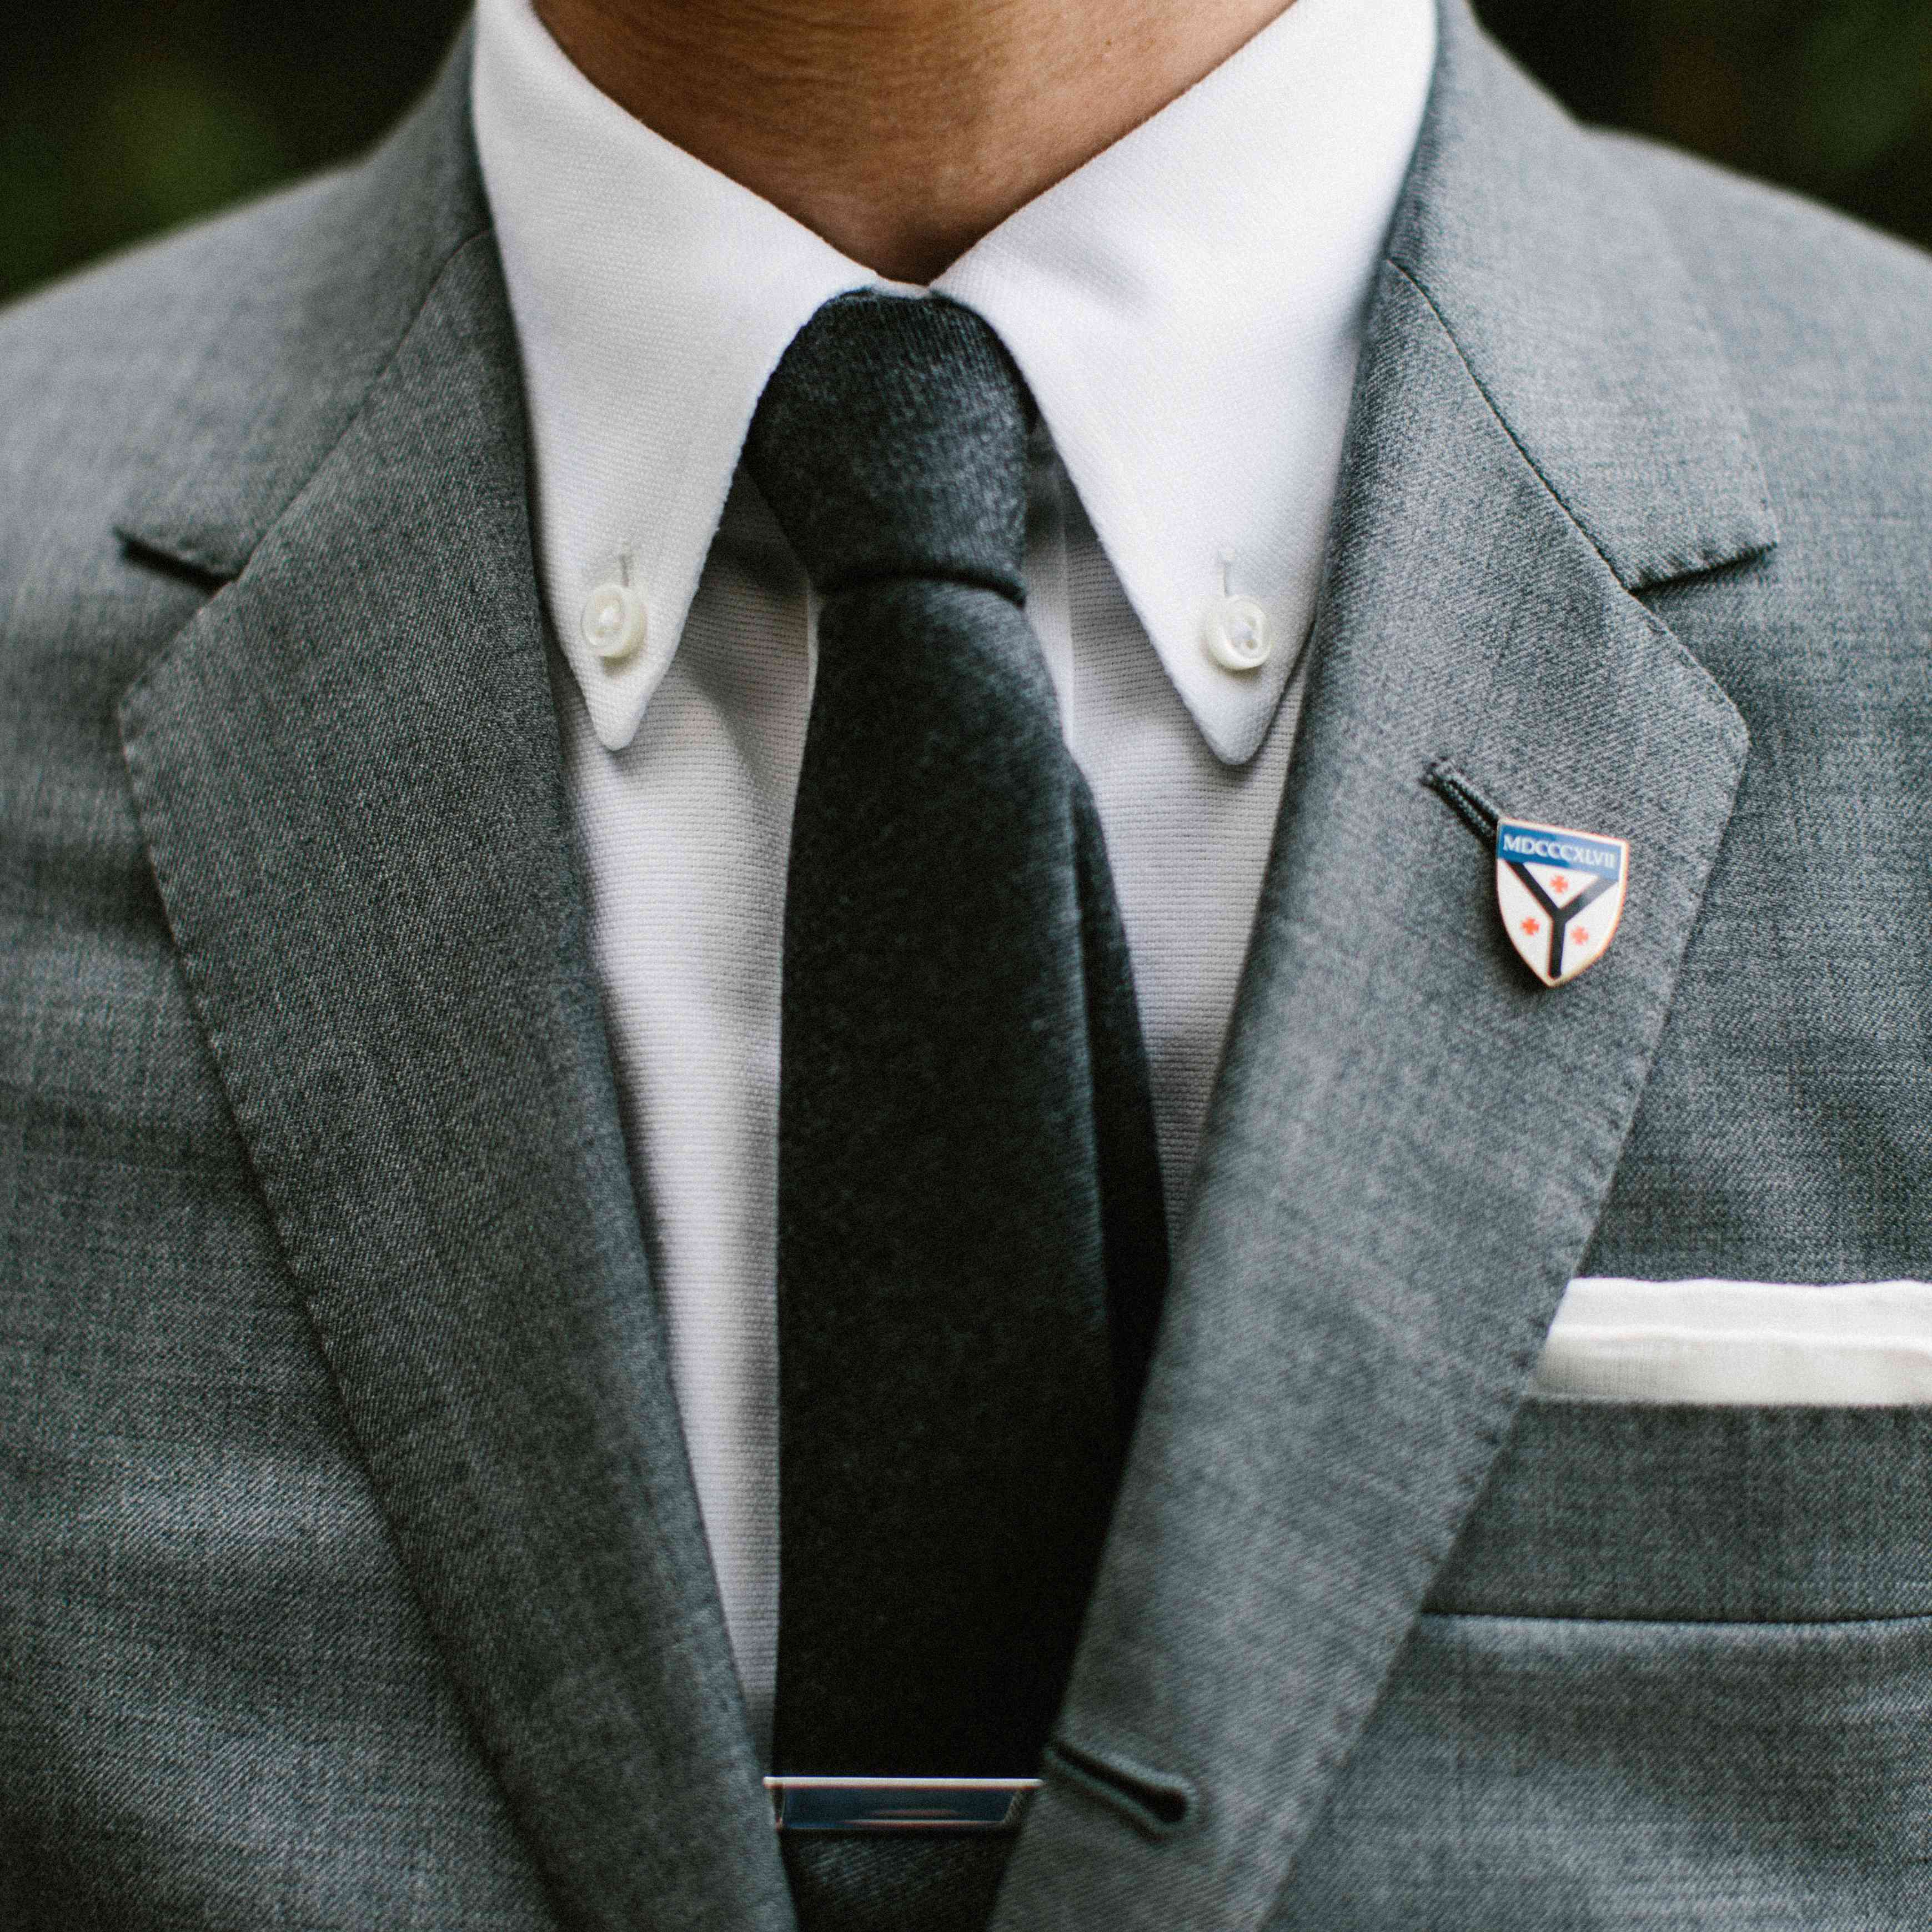 Groom tie close up